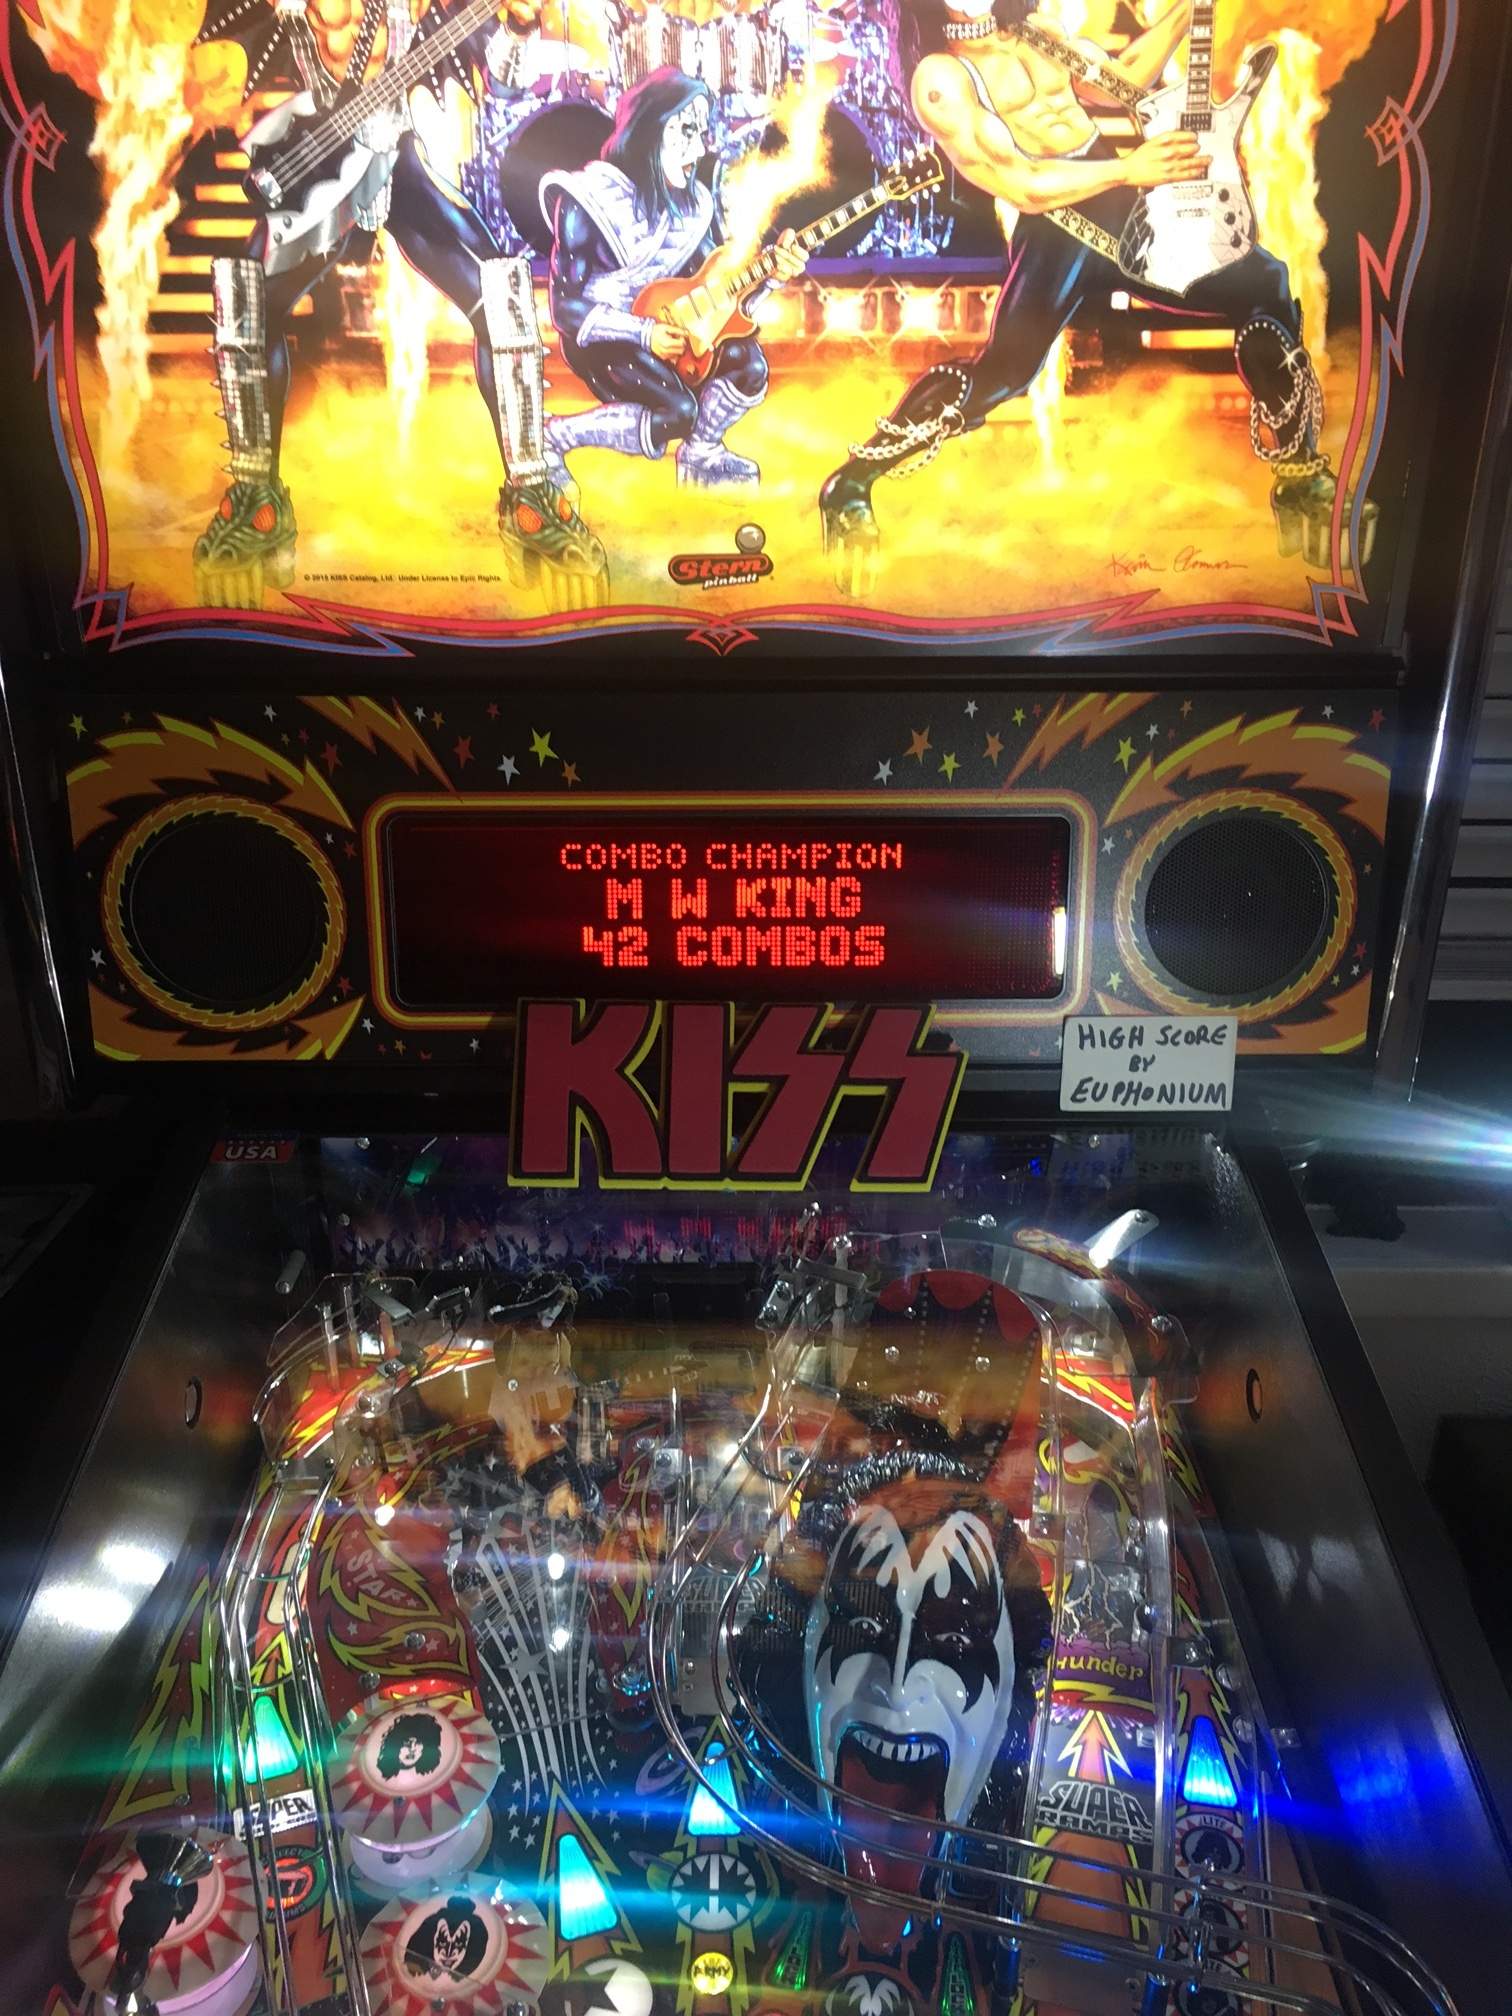 euphonium: Kiss [Stern Pinball]: Combo Champion (Pinball Bonus Mode) 42 points on 2018-08-18 09:16:53